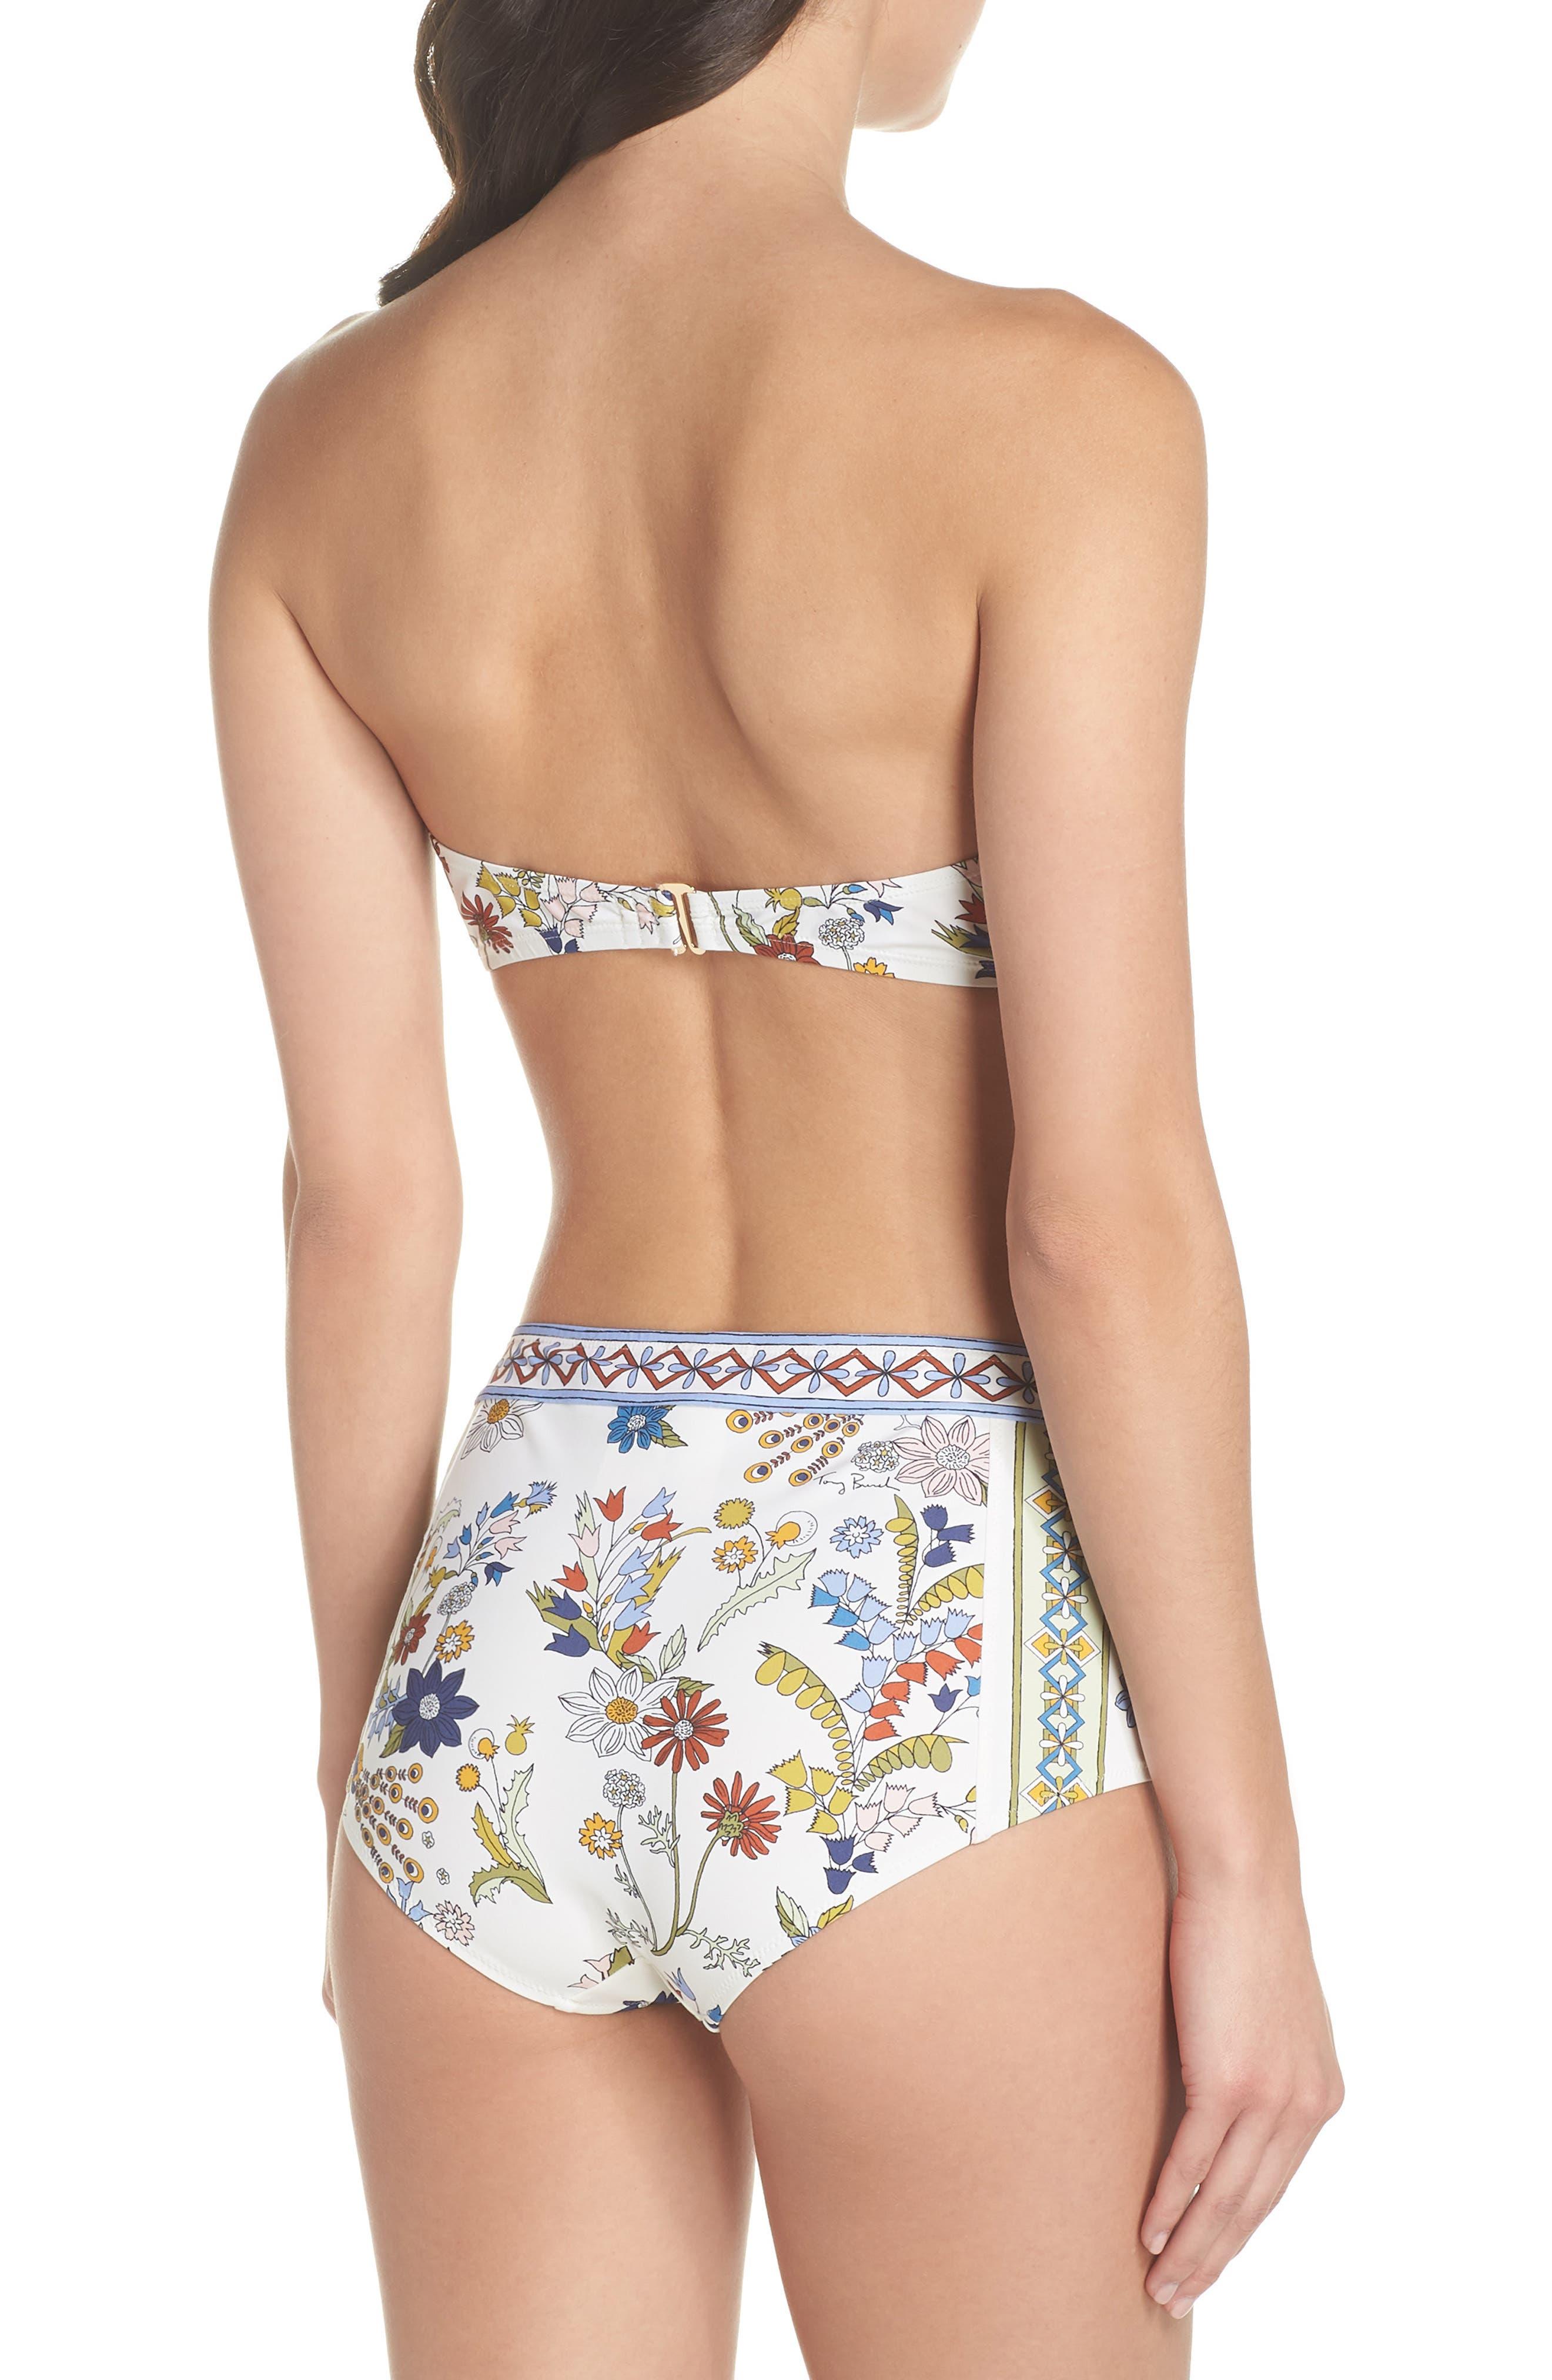 Meadow Folly Bikini Top,                             Alternate thumbnail 5, color,                             Ivory Meadow Folly